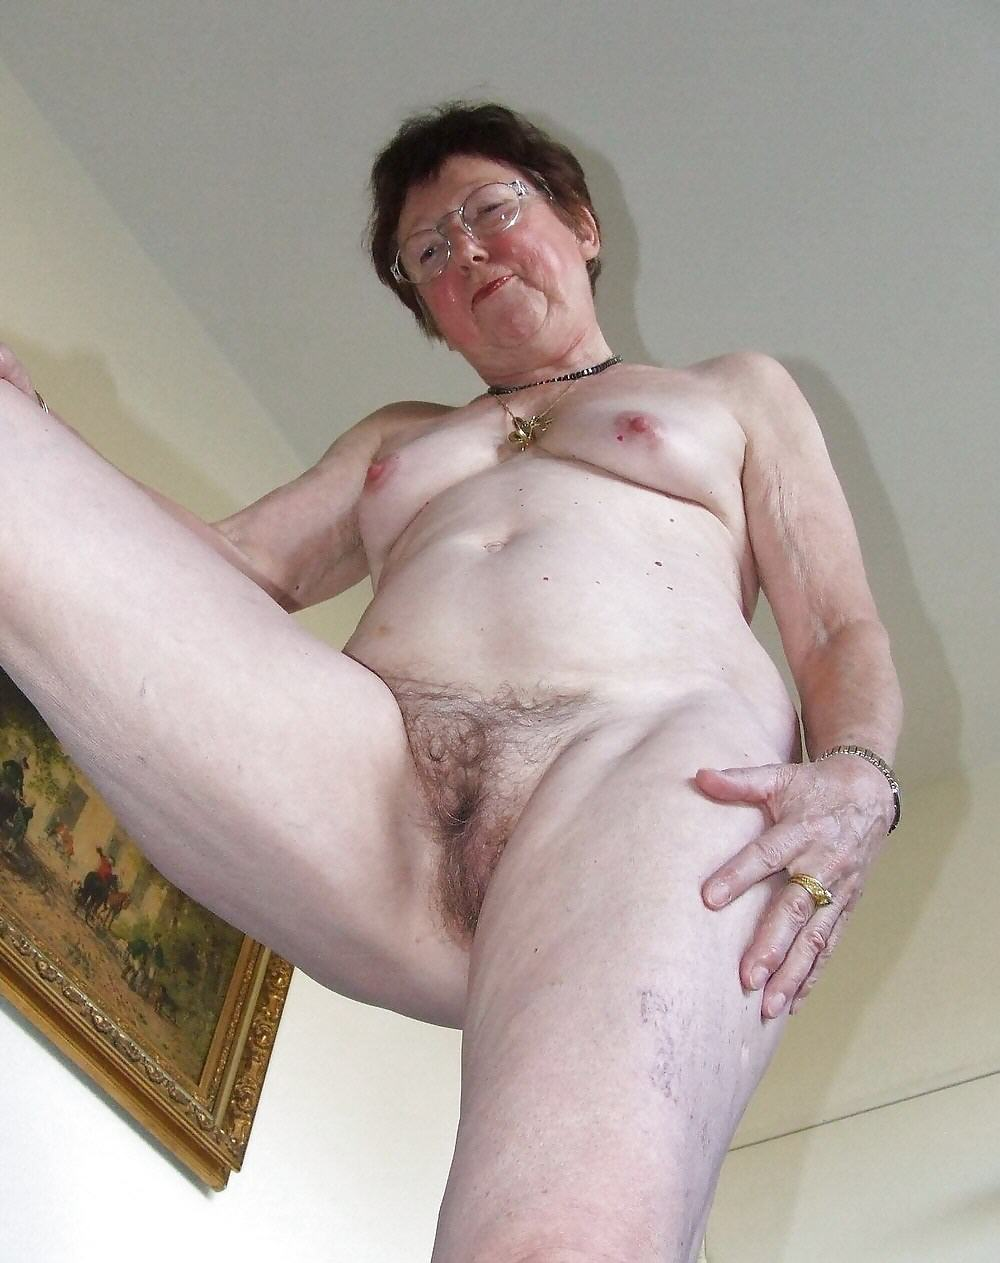 Asami sugiura naked